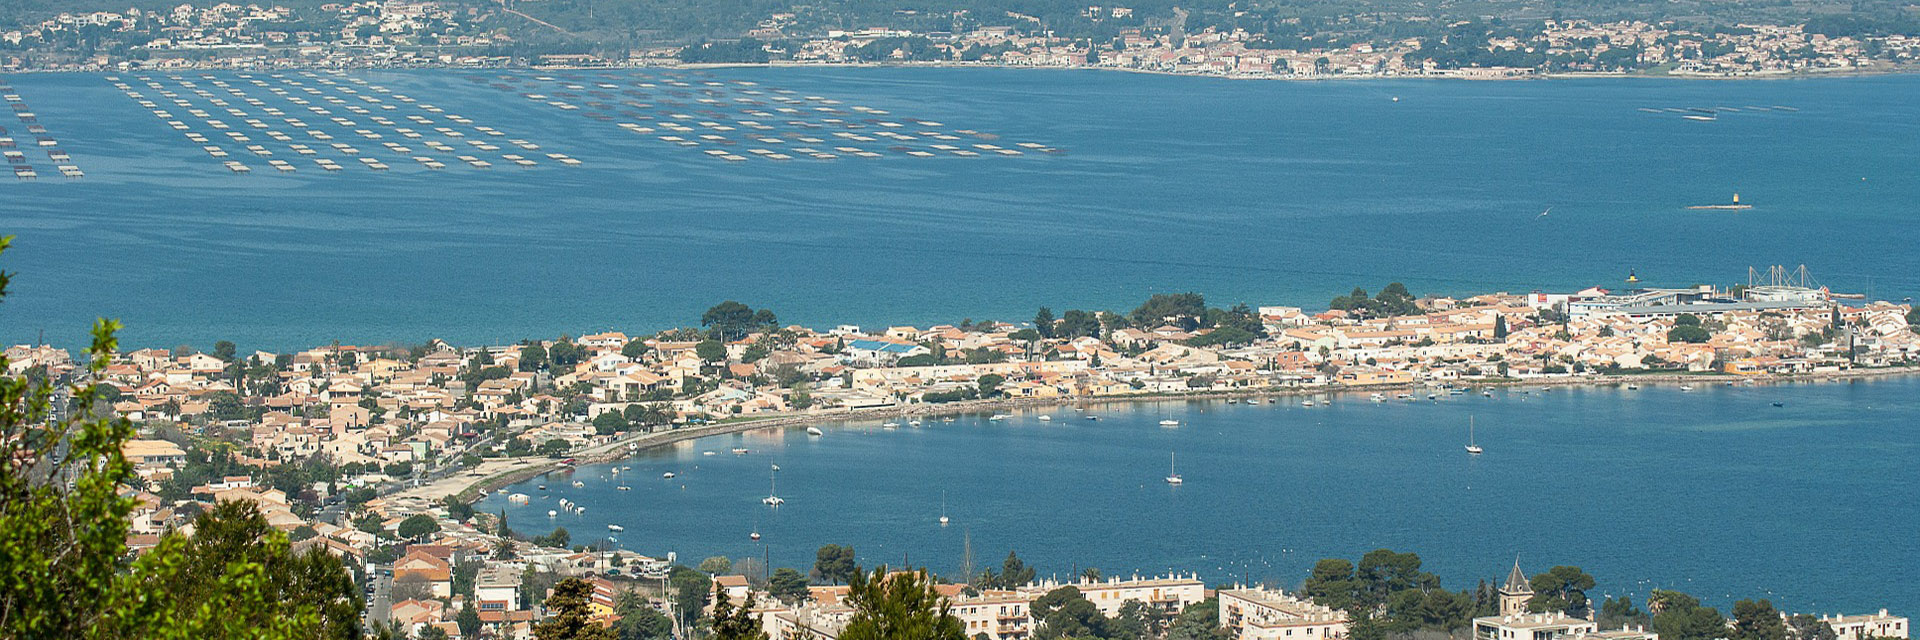 Village_club_vacances_mediterranee-sud-est-village-club-thalasse-sète